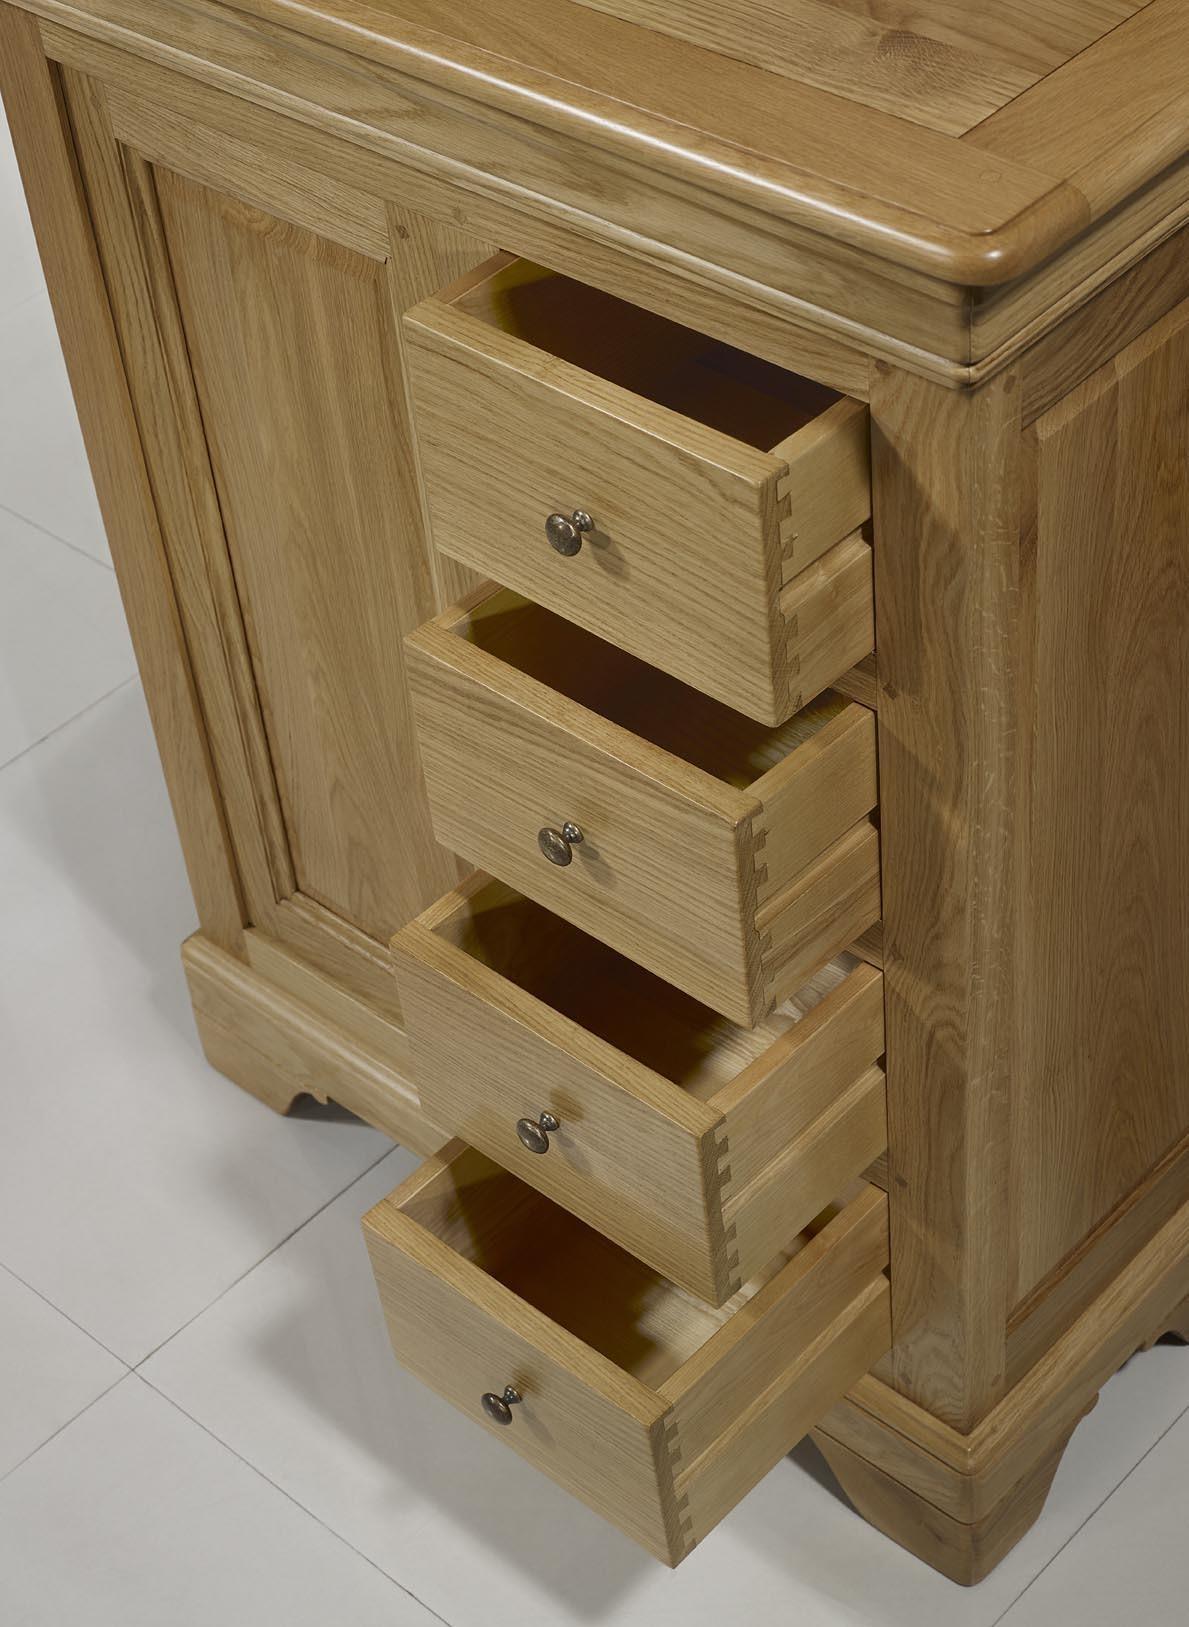 farinier 1 porte 5 tiroirs jean en ch ne massif de style louis philippe meuble en ch ne massif. Black Bedroom Furniture Sets. Home Design Ideas